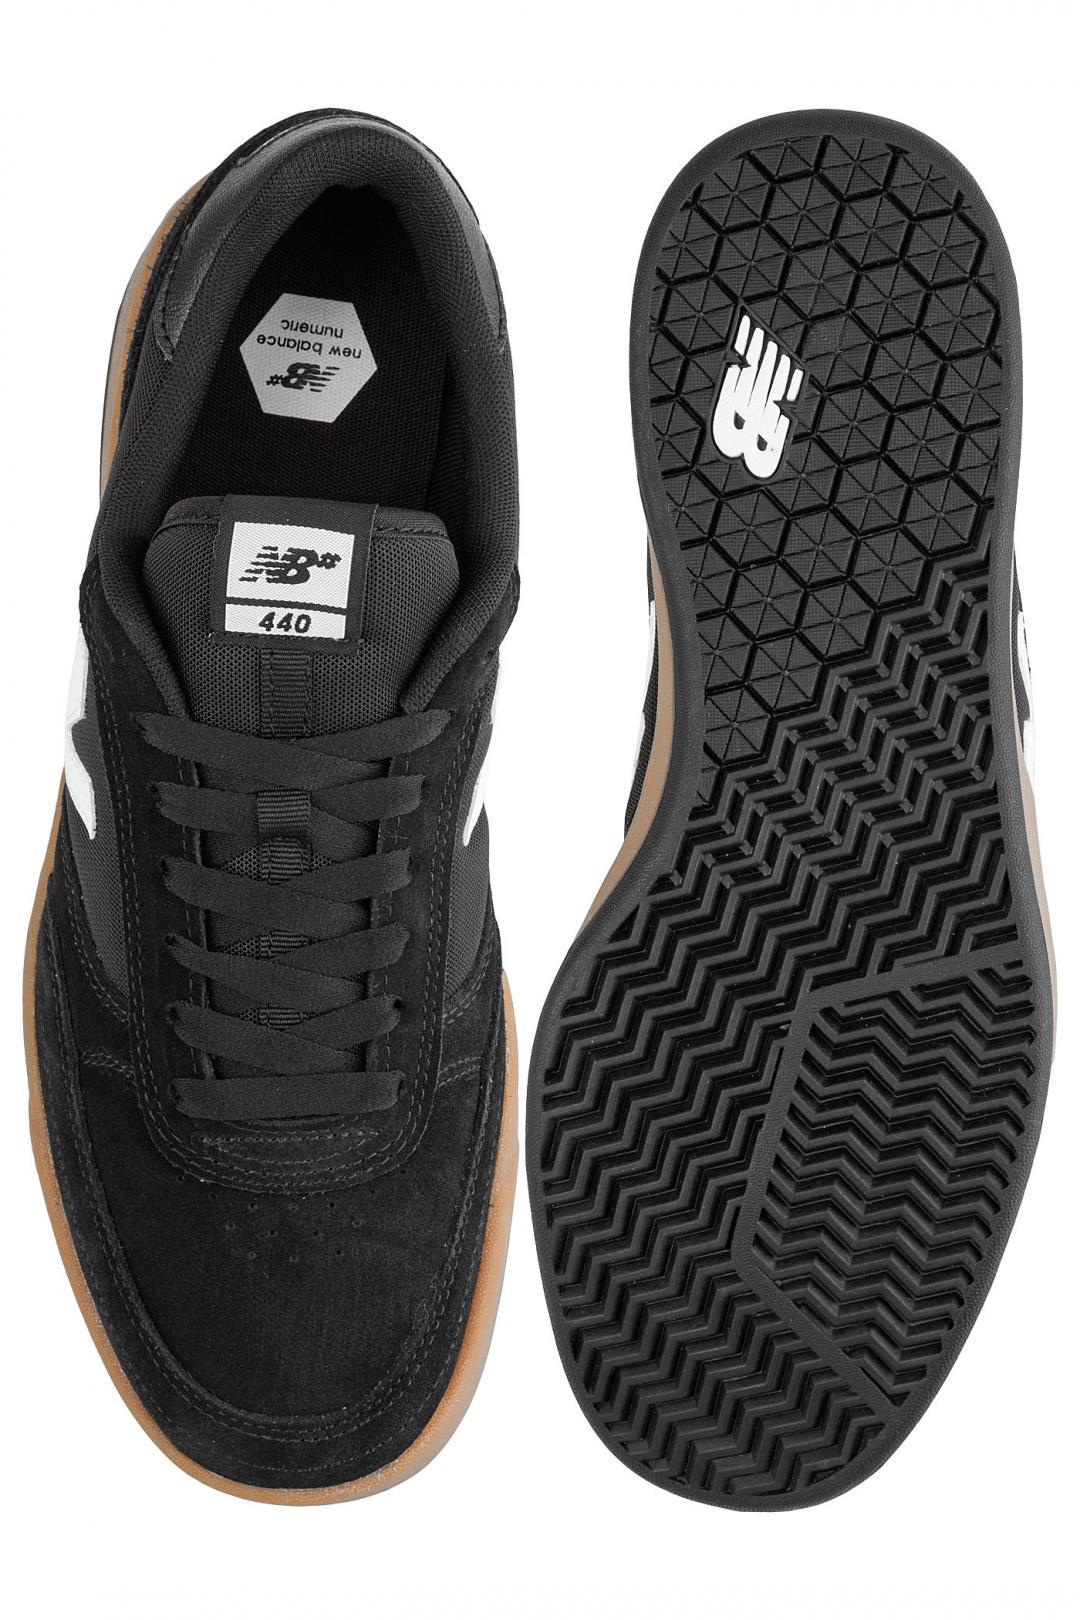 Uomo New Balance Numeric 440 black grey gum | Sneaker